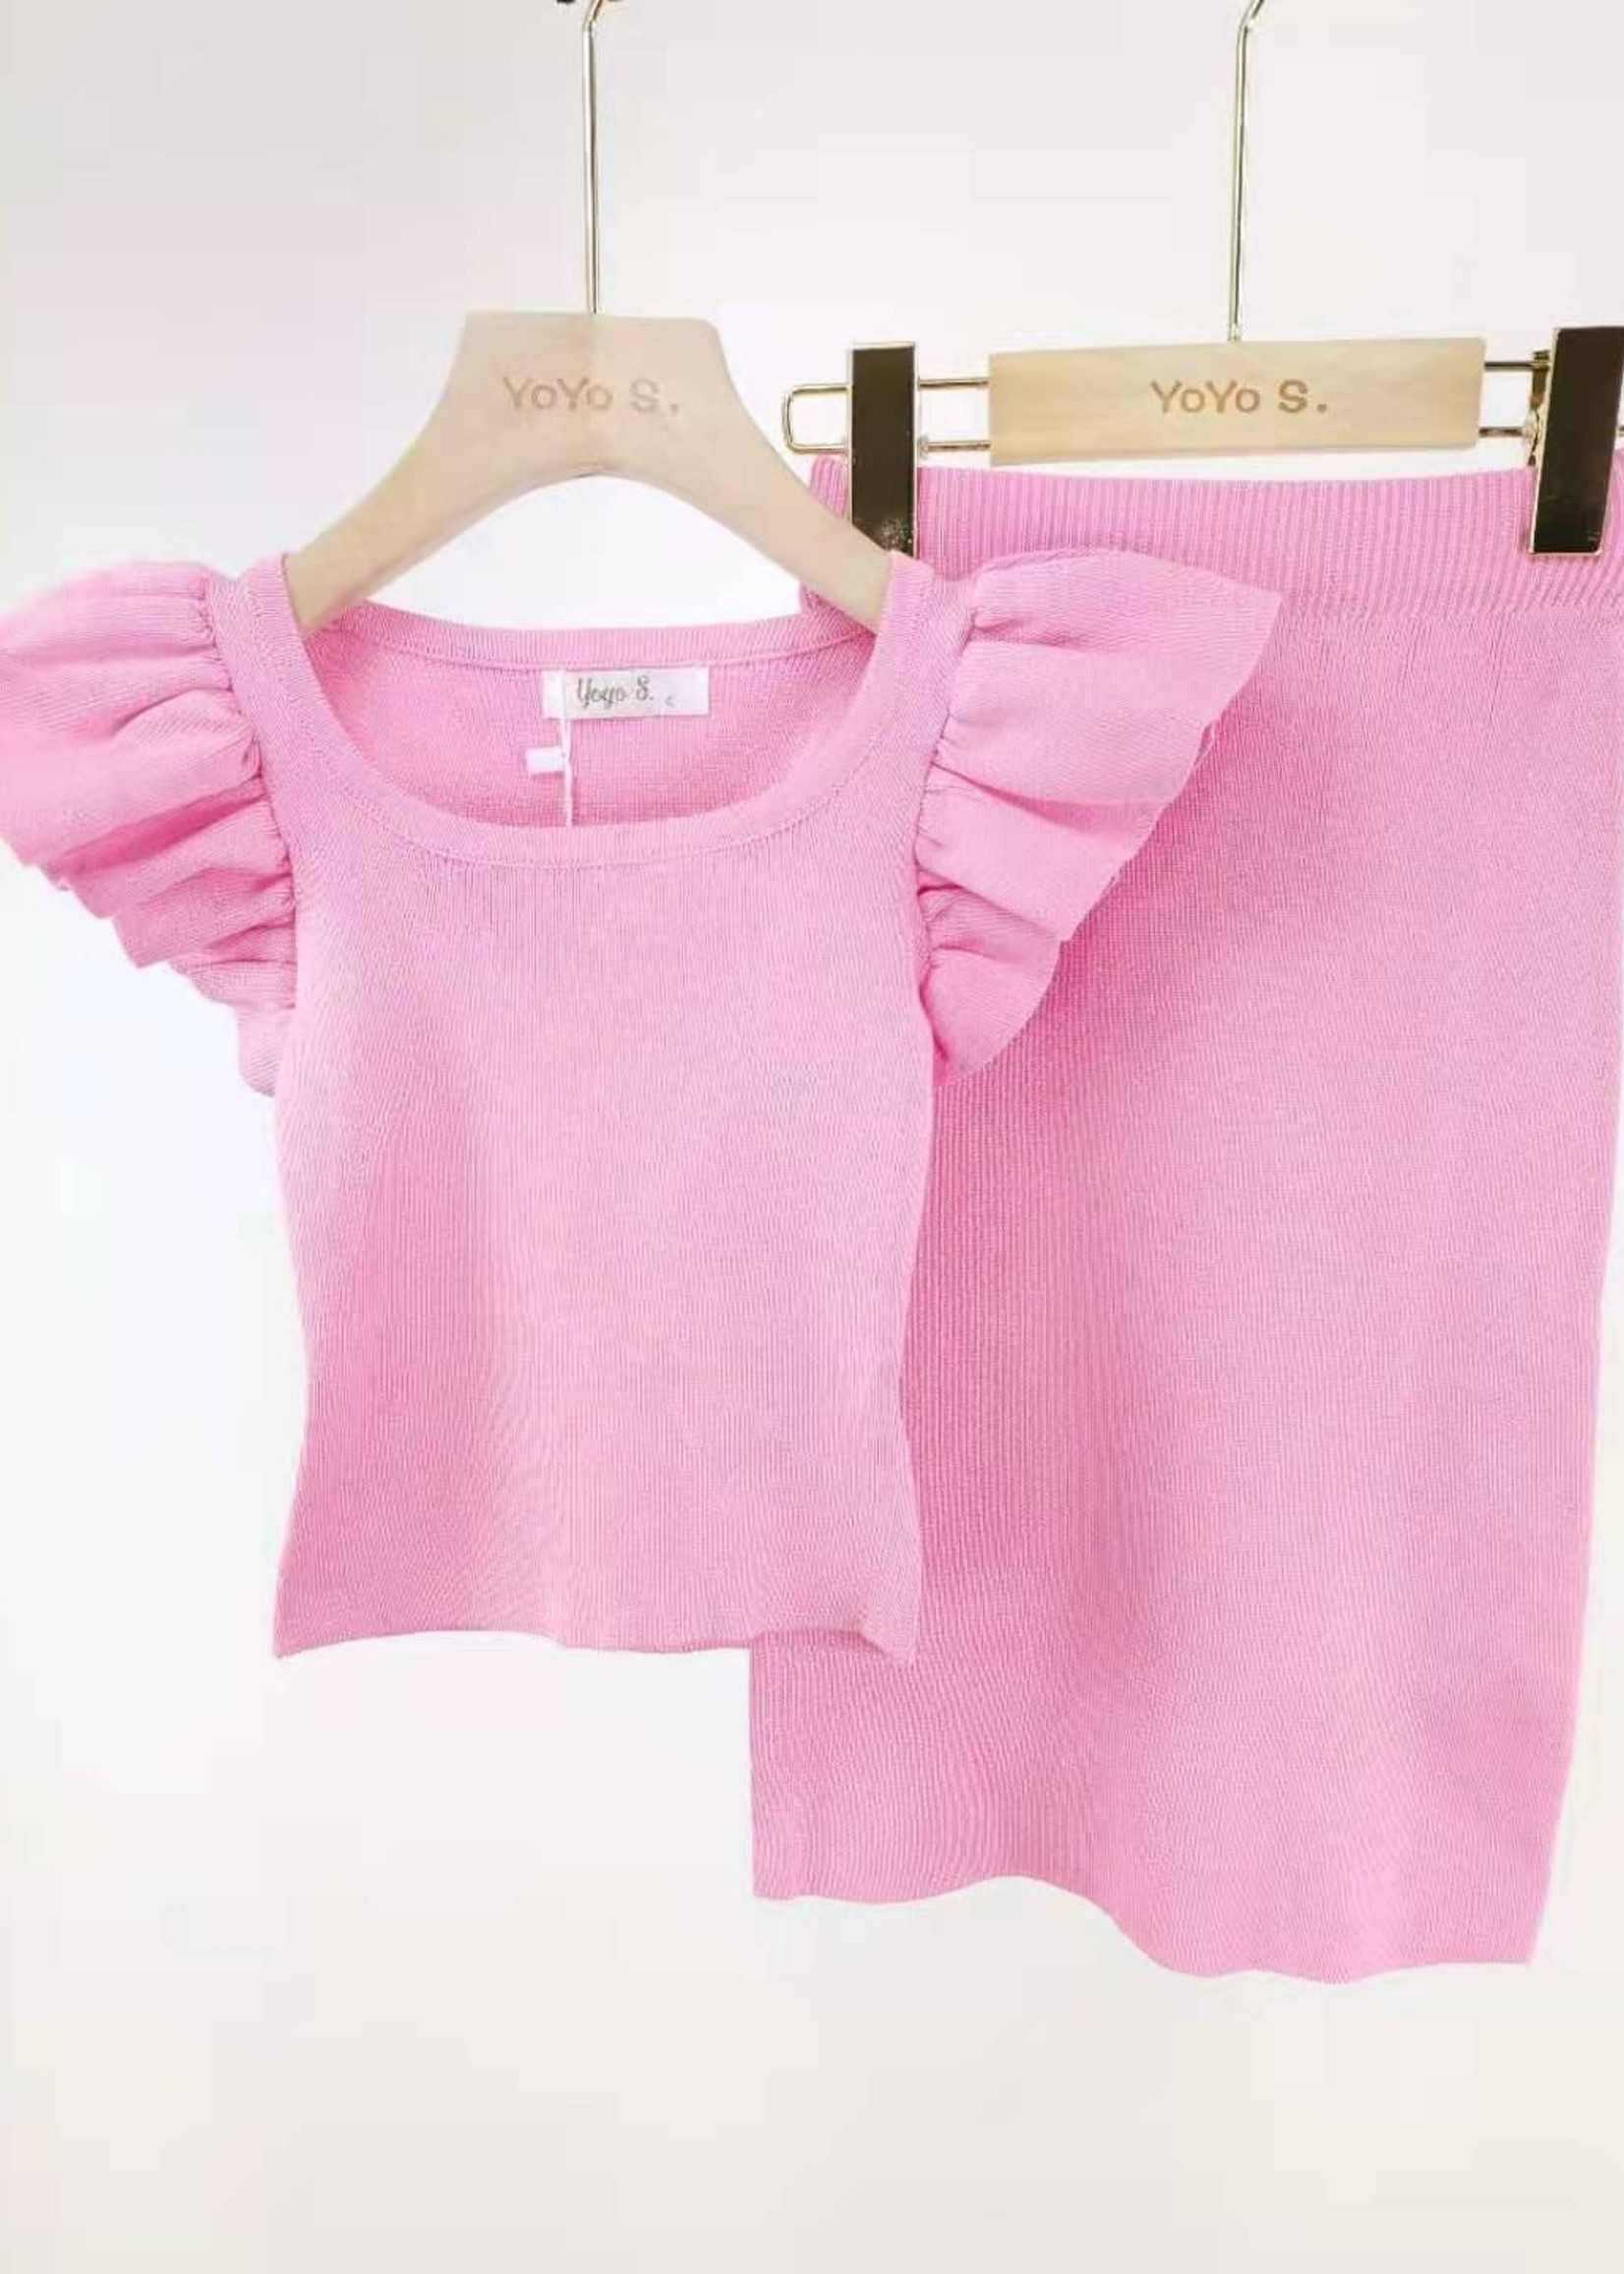 Divanis Divanis long skirt set pink